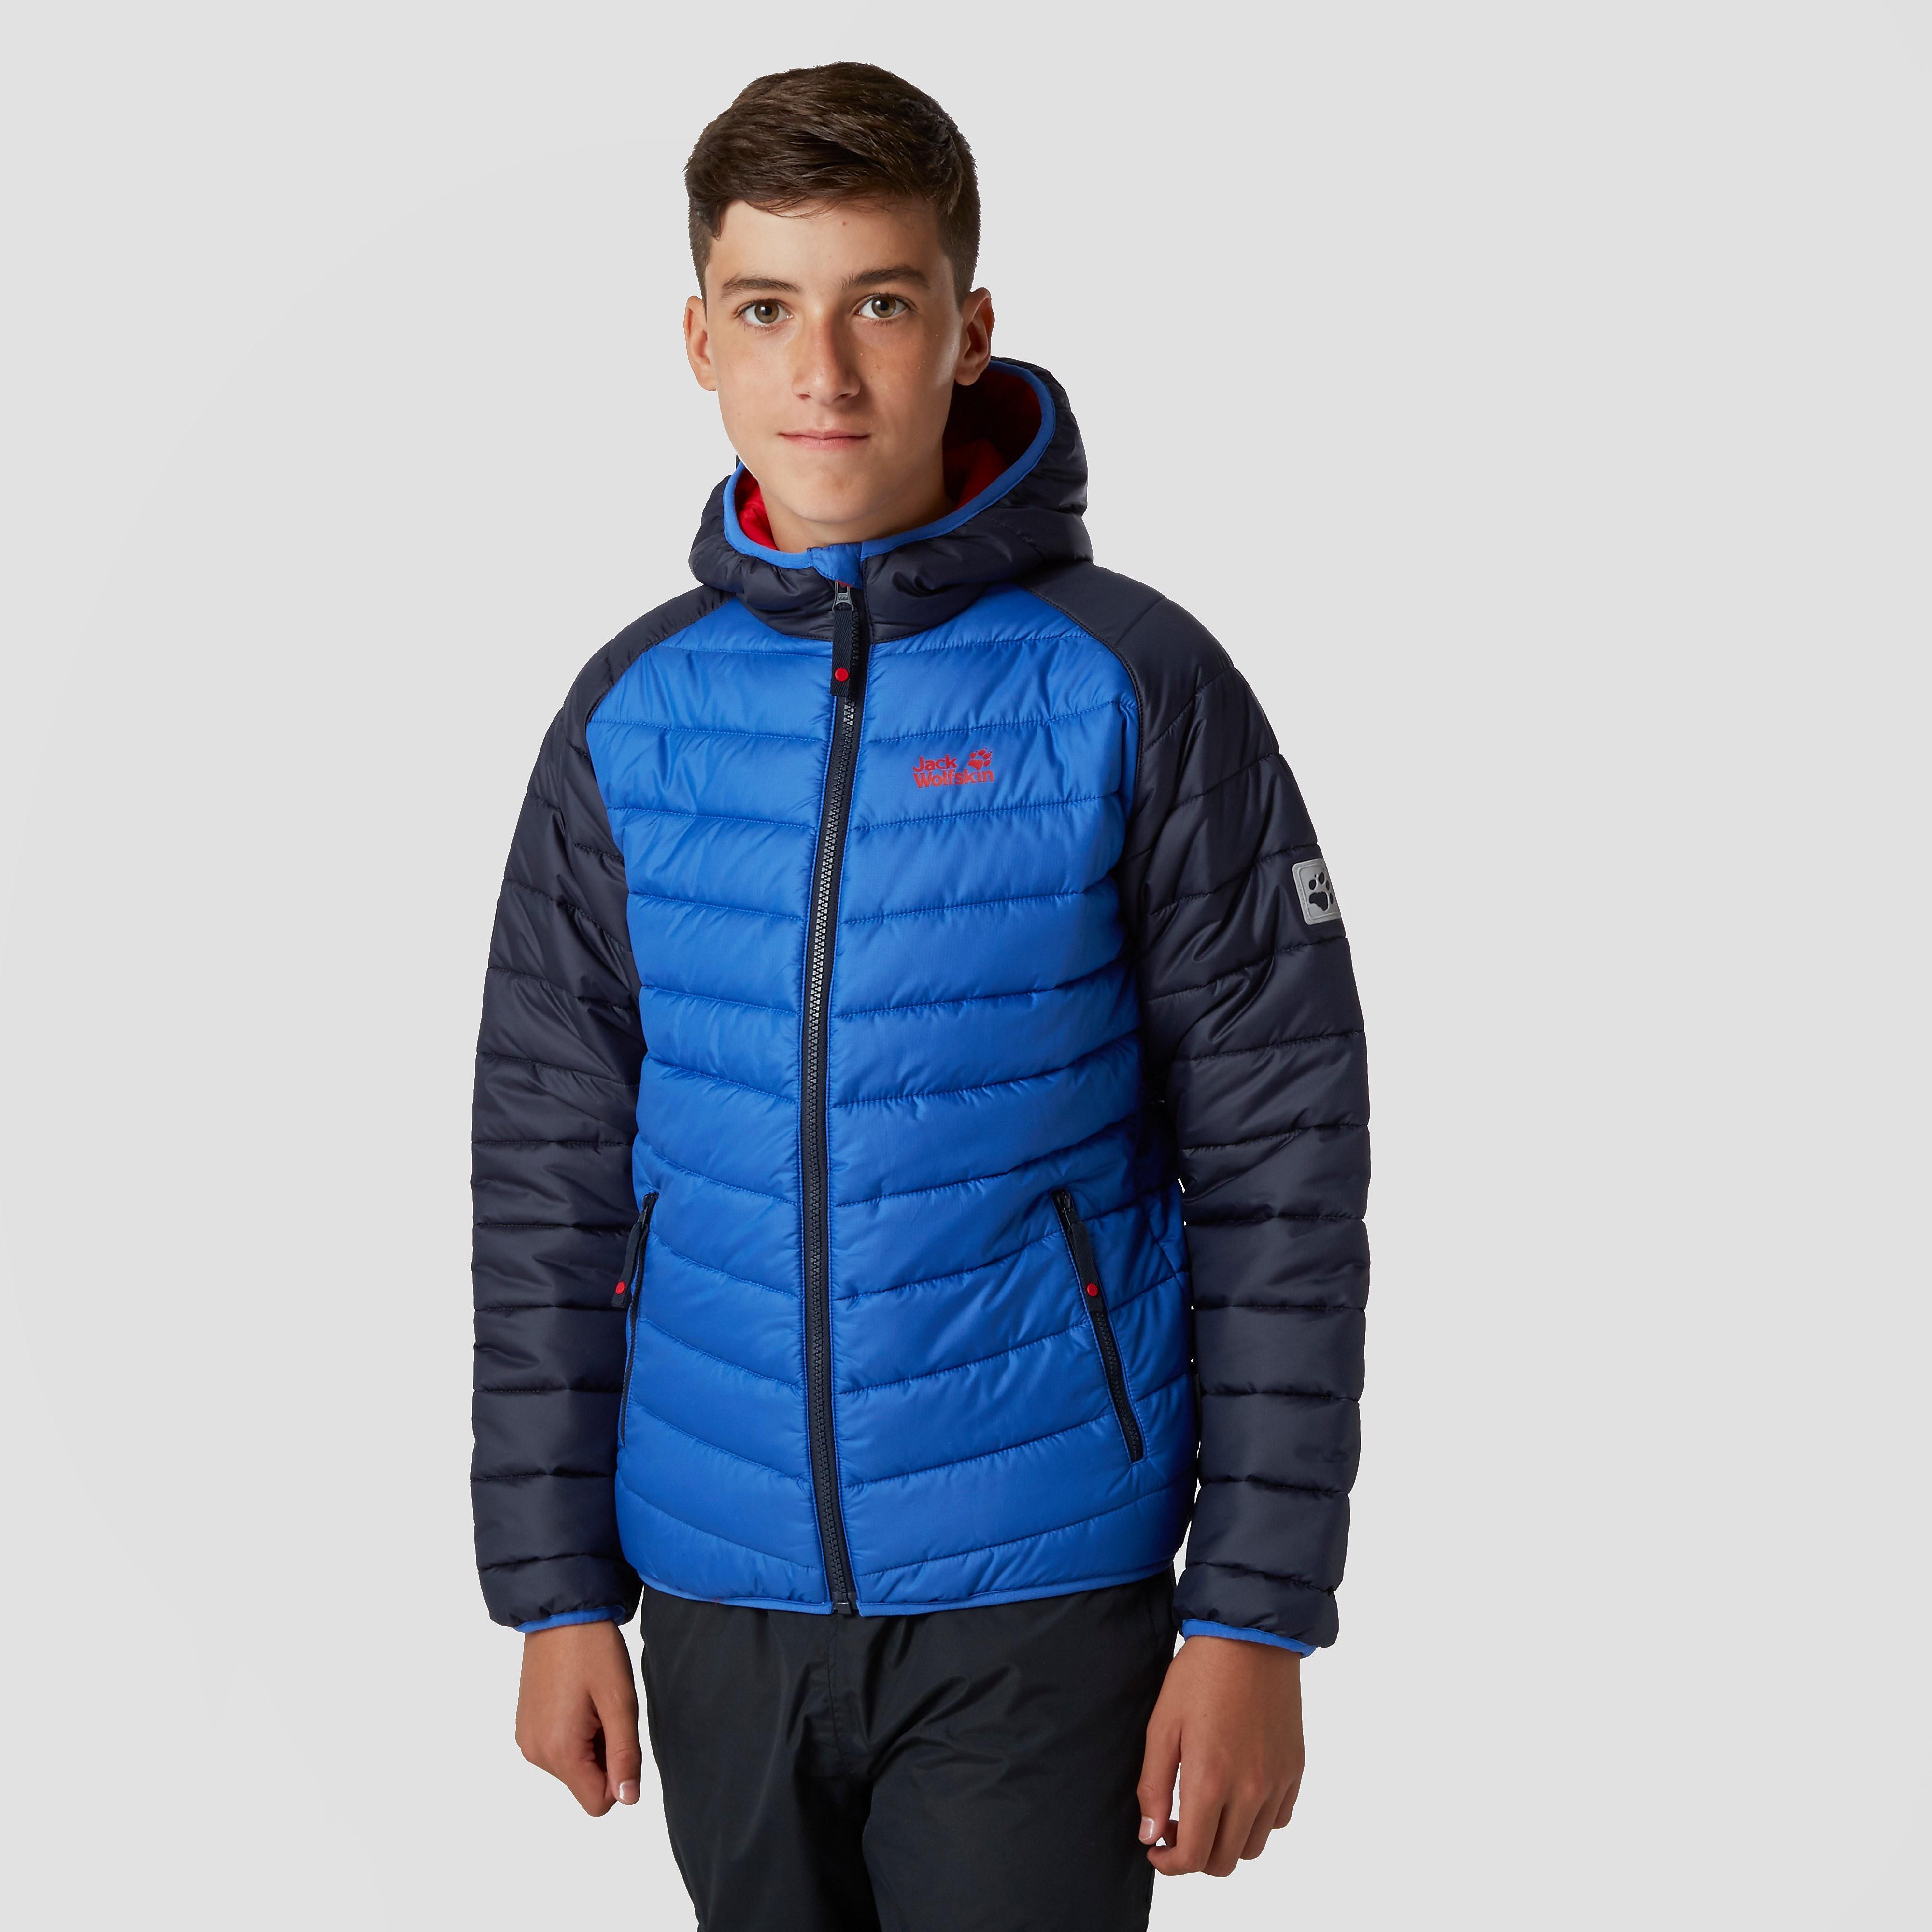 Jack Wolfskin Boys' Zenon Insulated Jacket